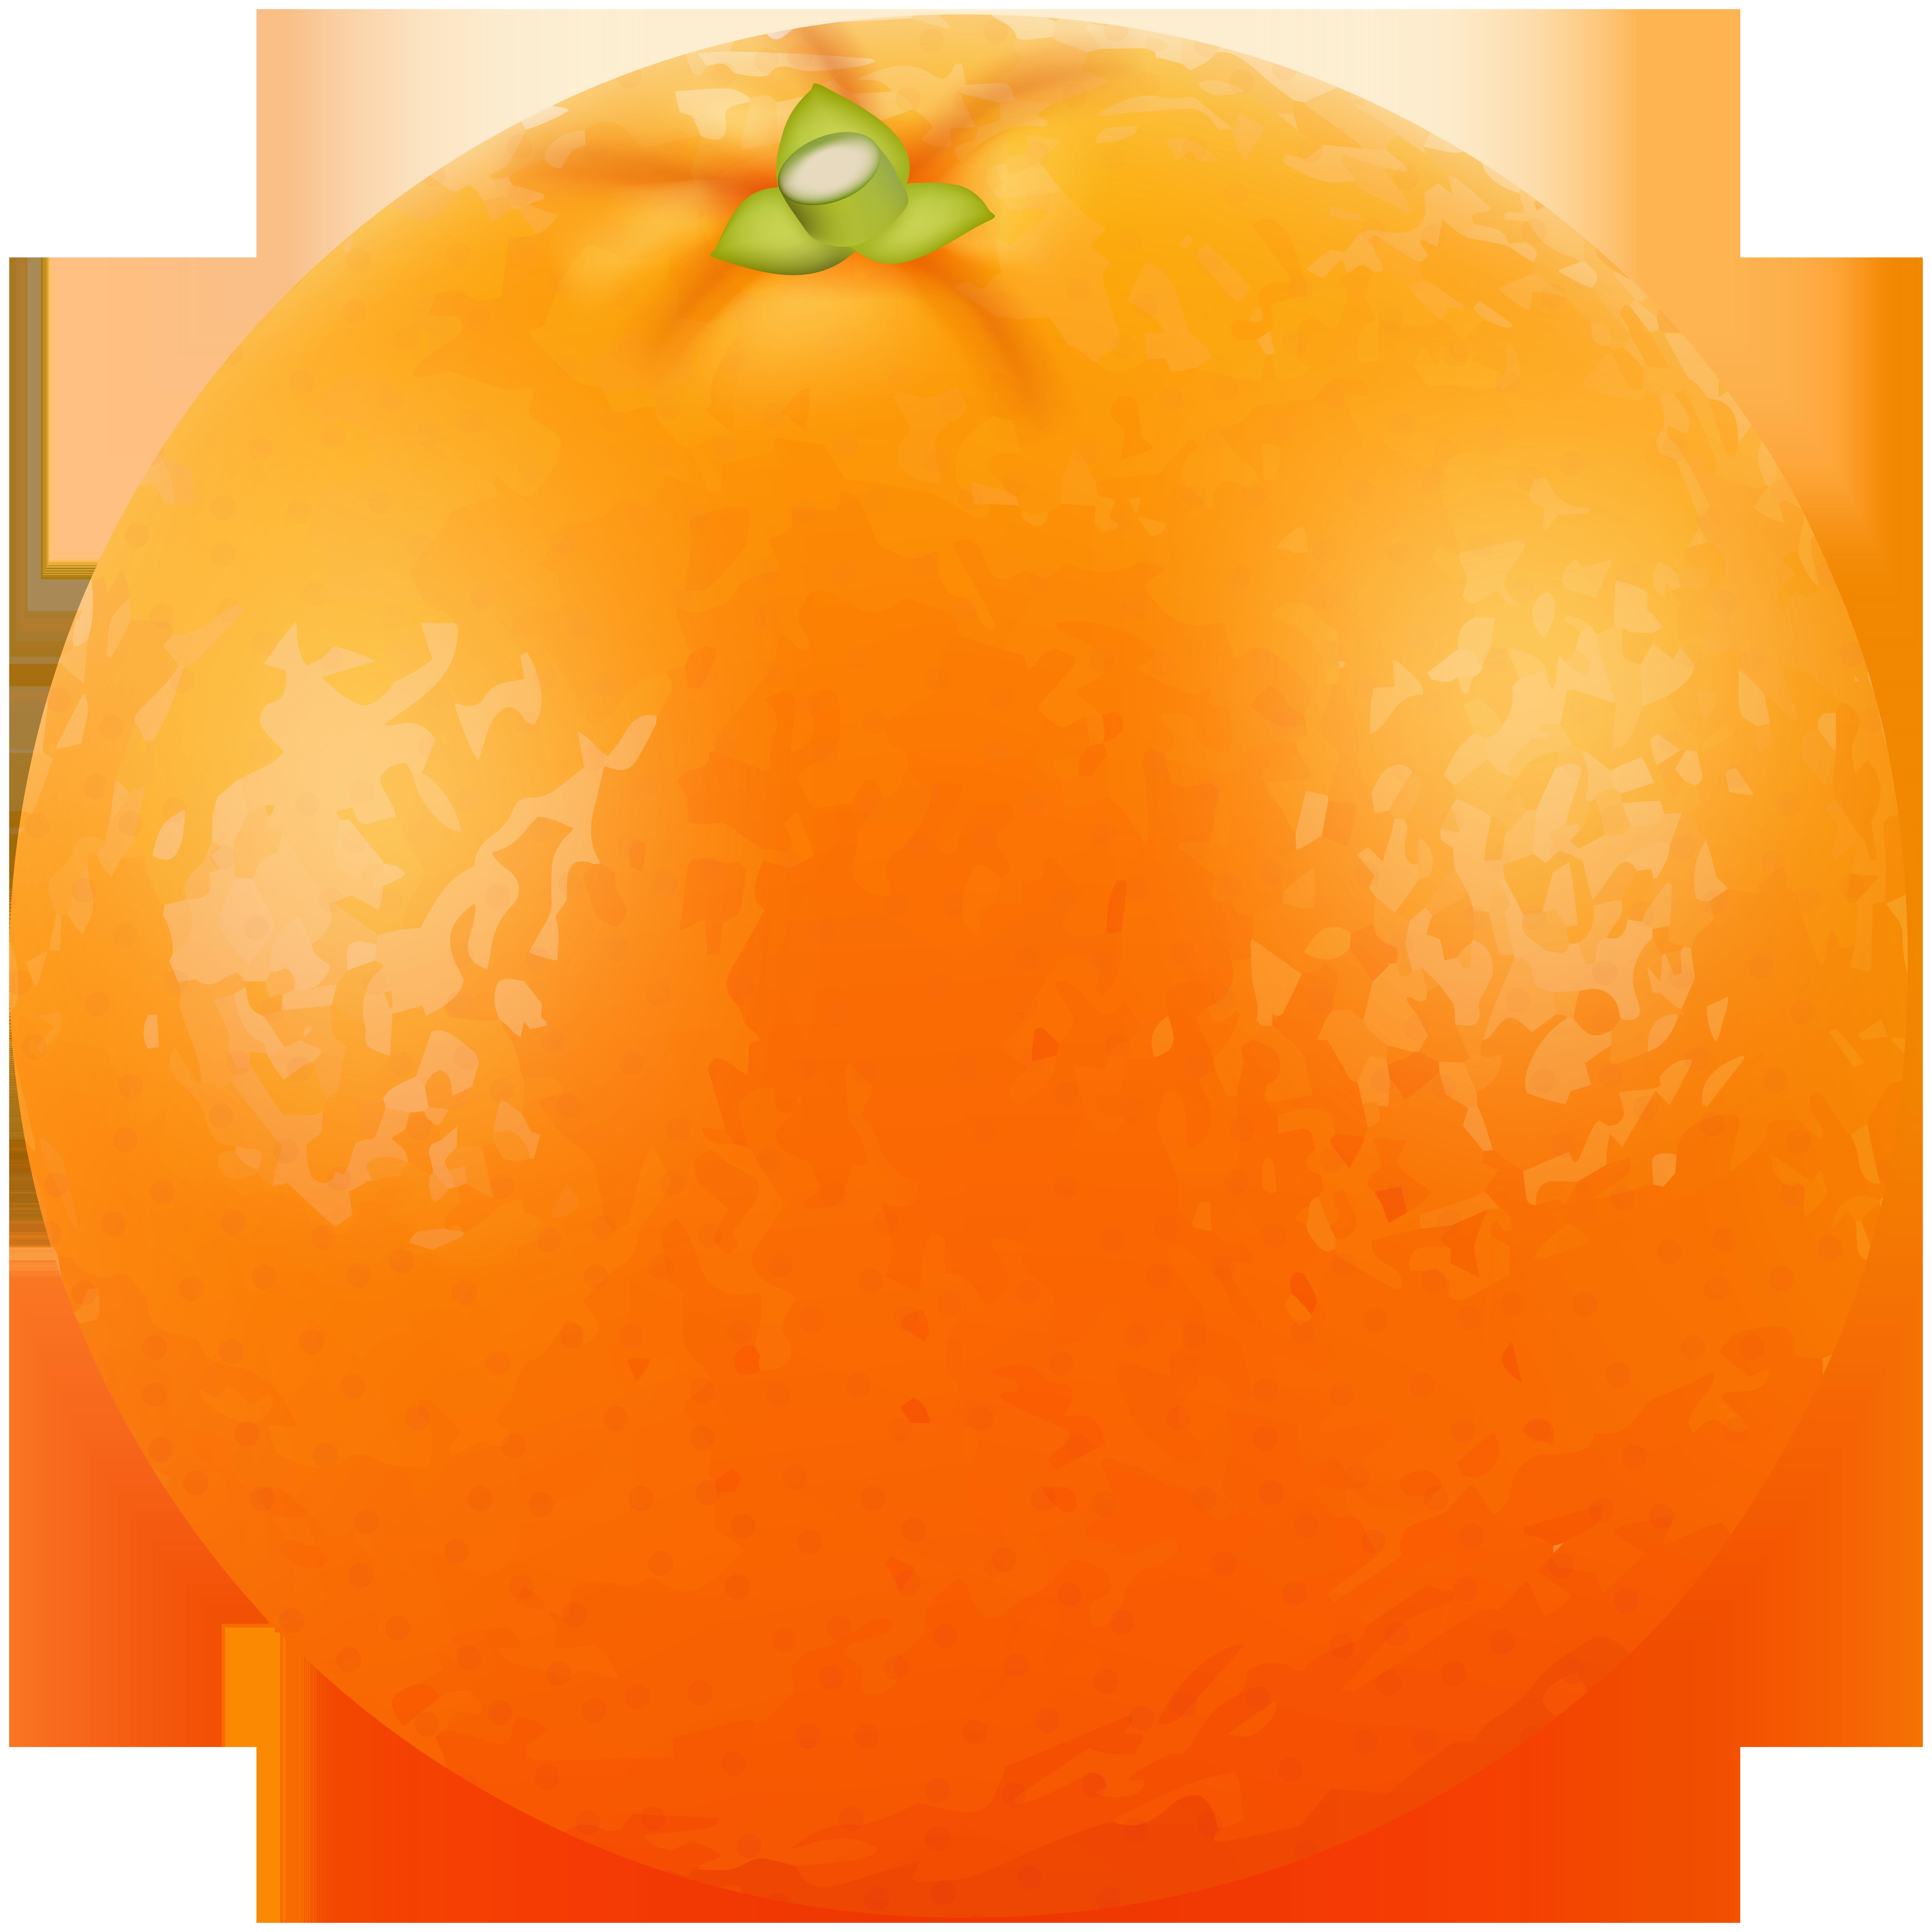 Png clip art image. Orange clipart orange fruit